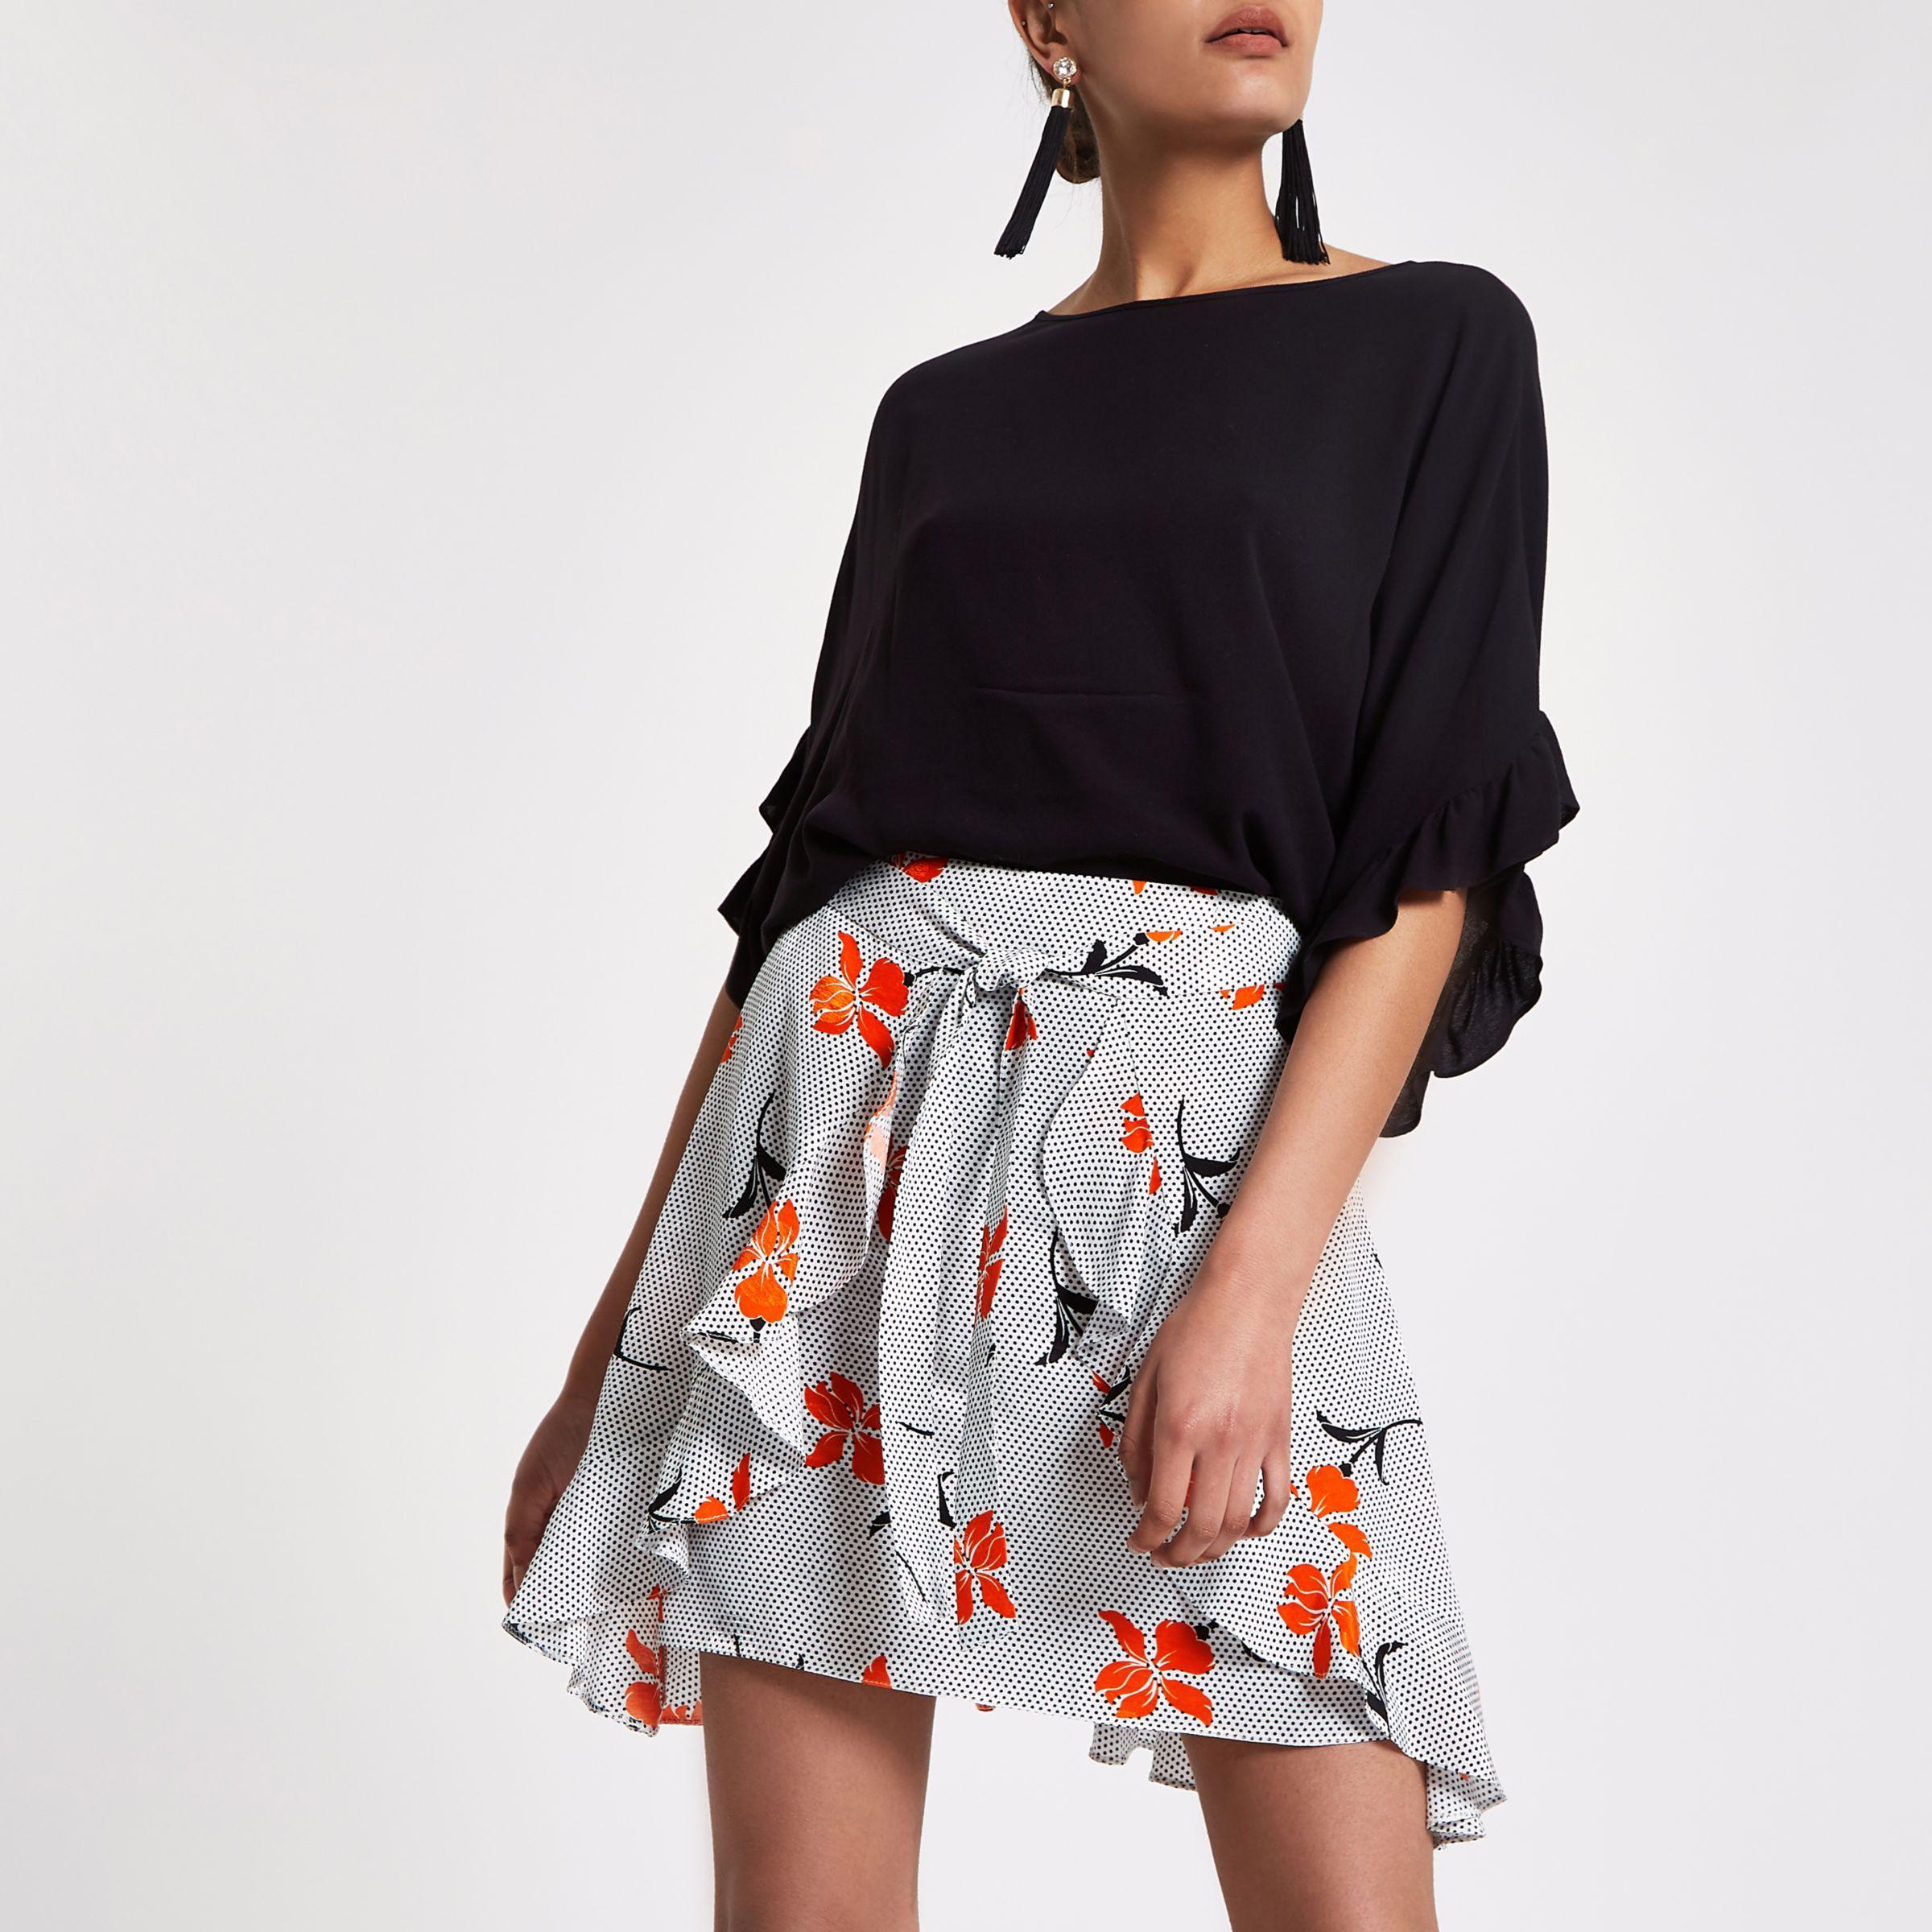 79efb4982 River Island Black Floral Spot Wrap Tie Front Mini Skirt in Black - Lyst